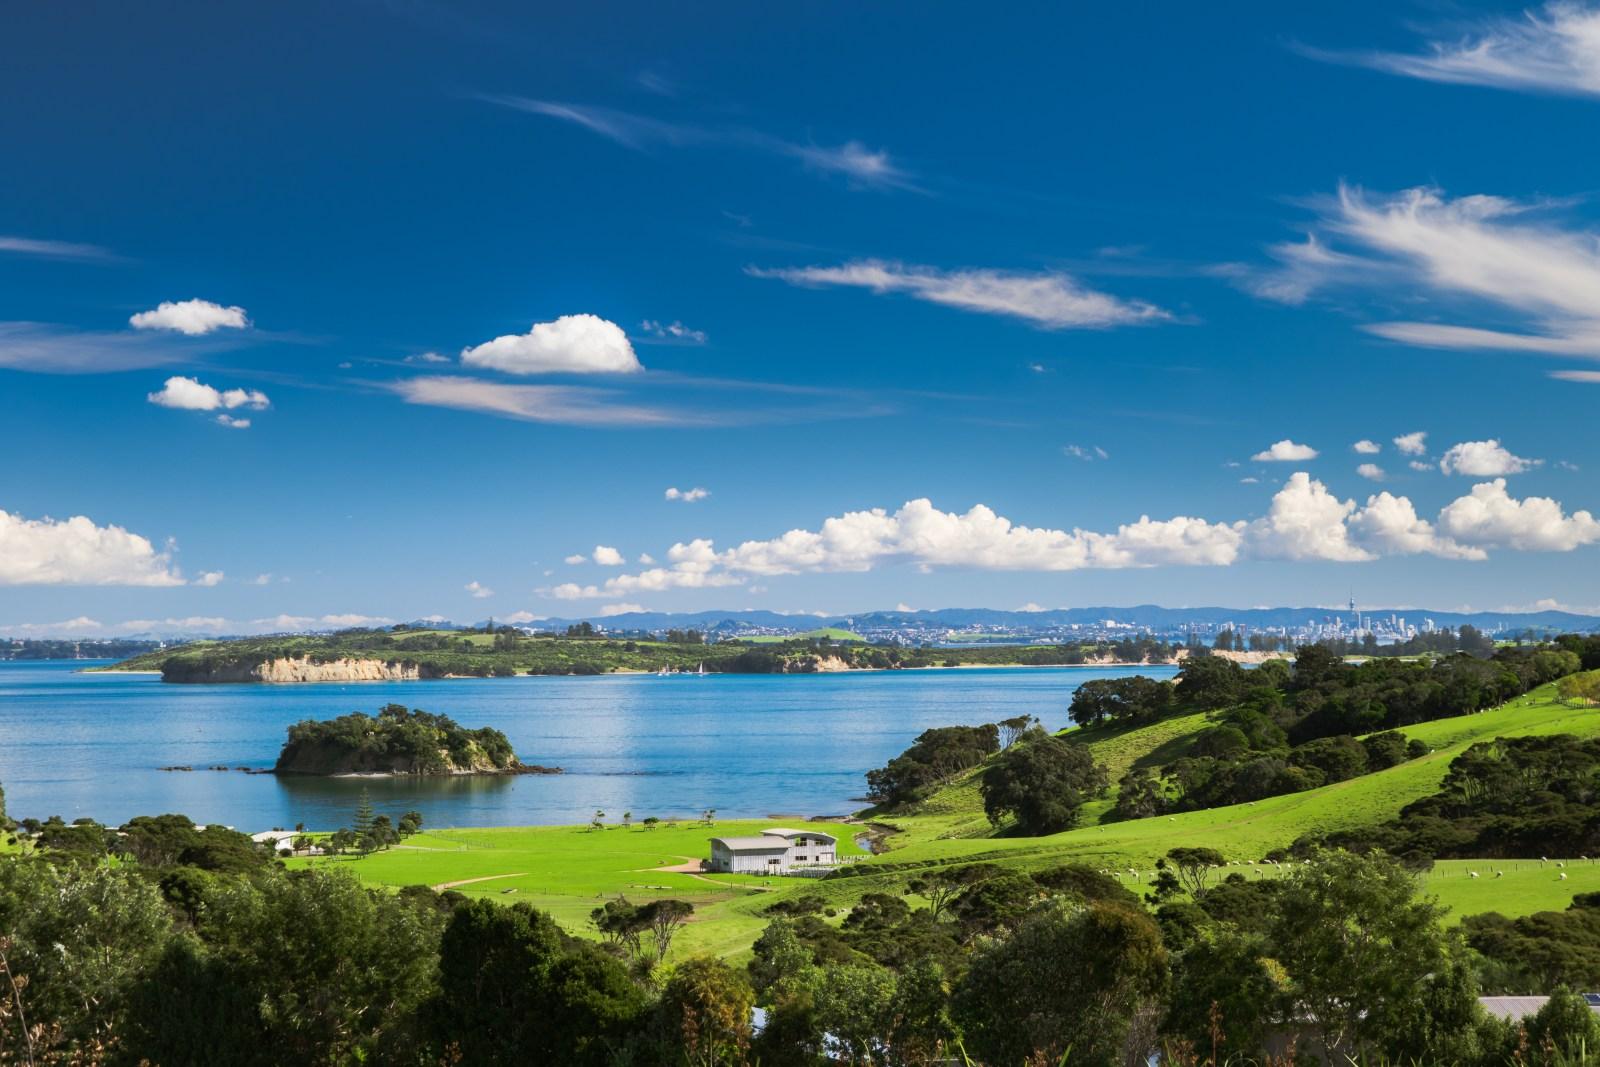 Church Bay, Hauraki Gulf, Waiheke Island, New Zealand, view from Cable Bay vineyards